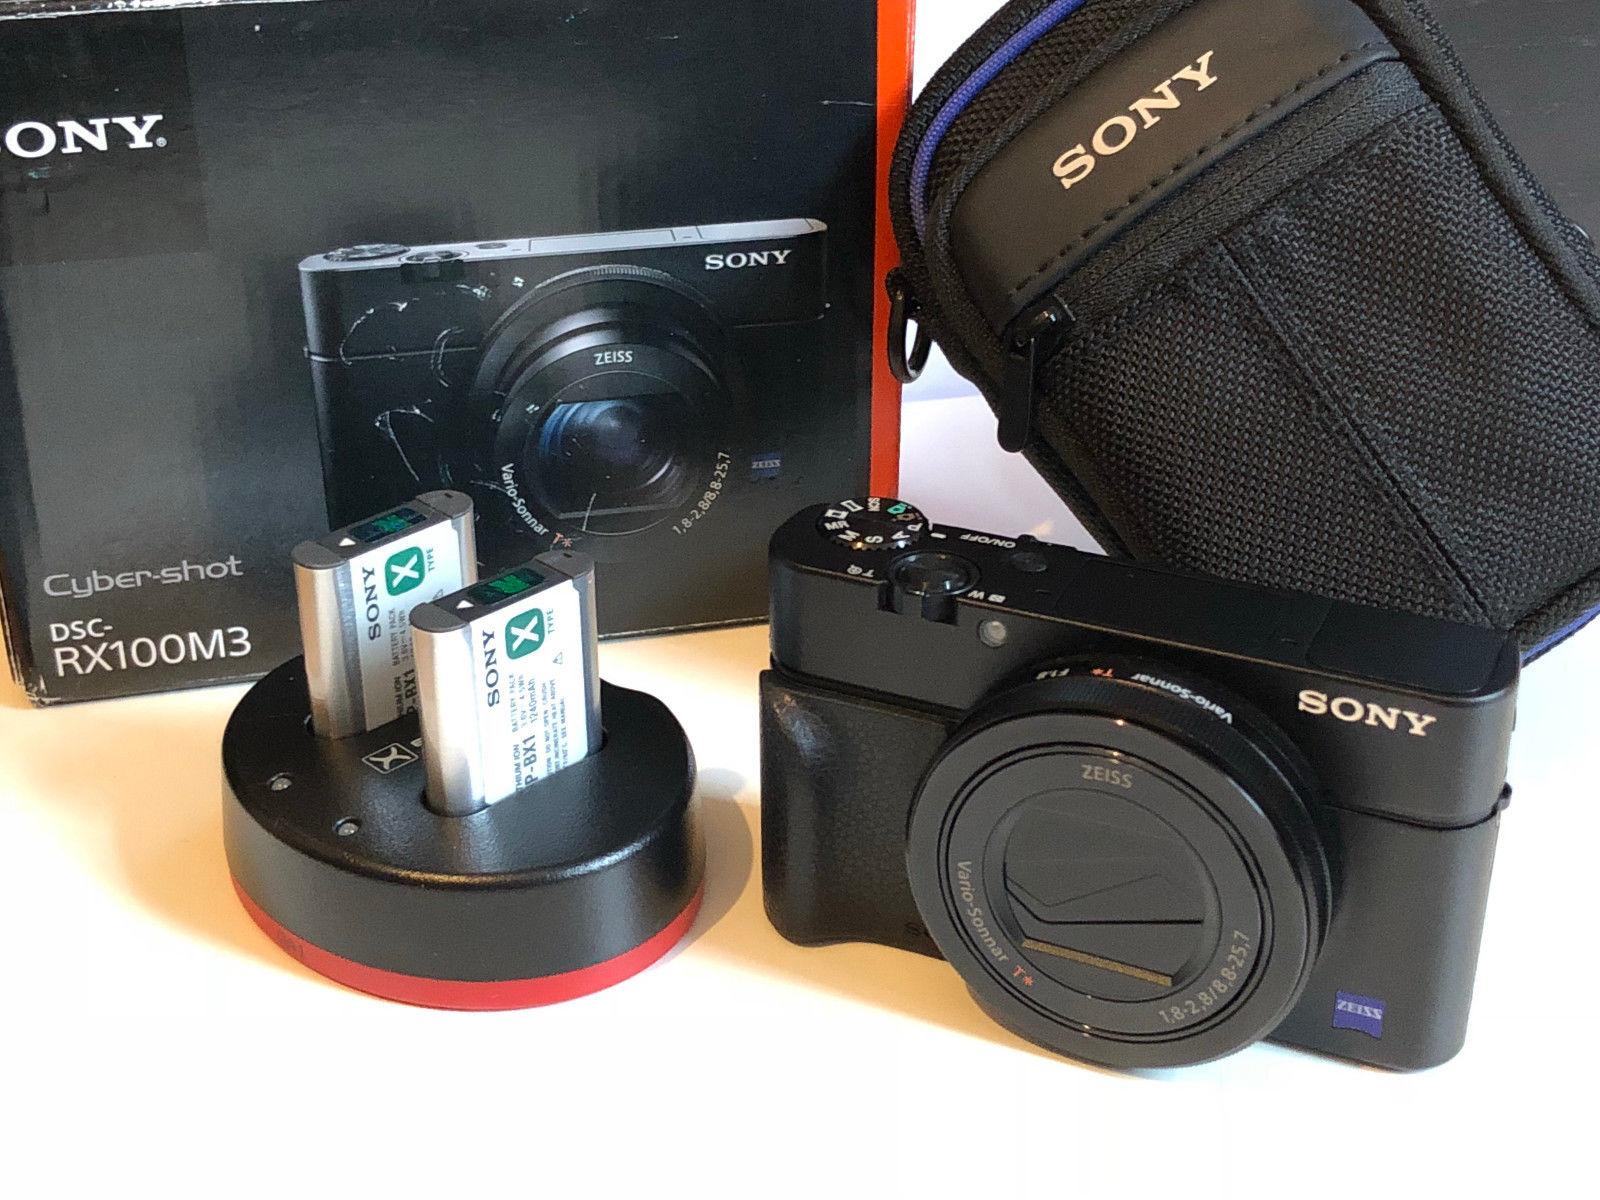 Sony Cyber-shot DSC-RX100M3, Mark III  Digitalkamera - Zubehörpaket - neuwertig!